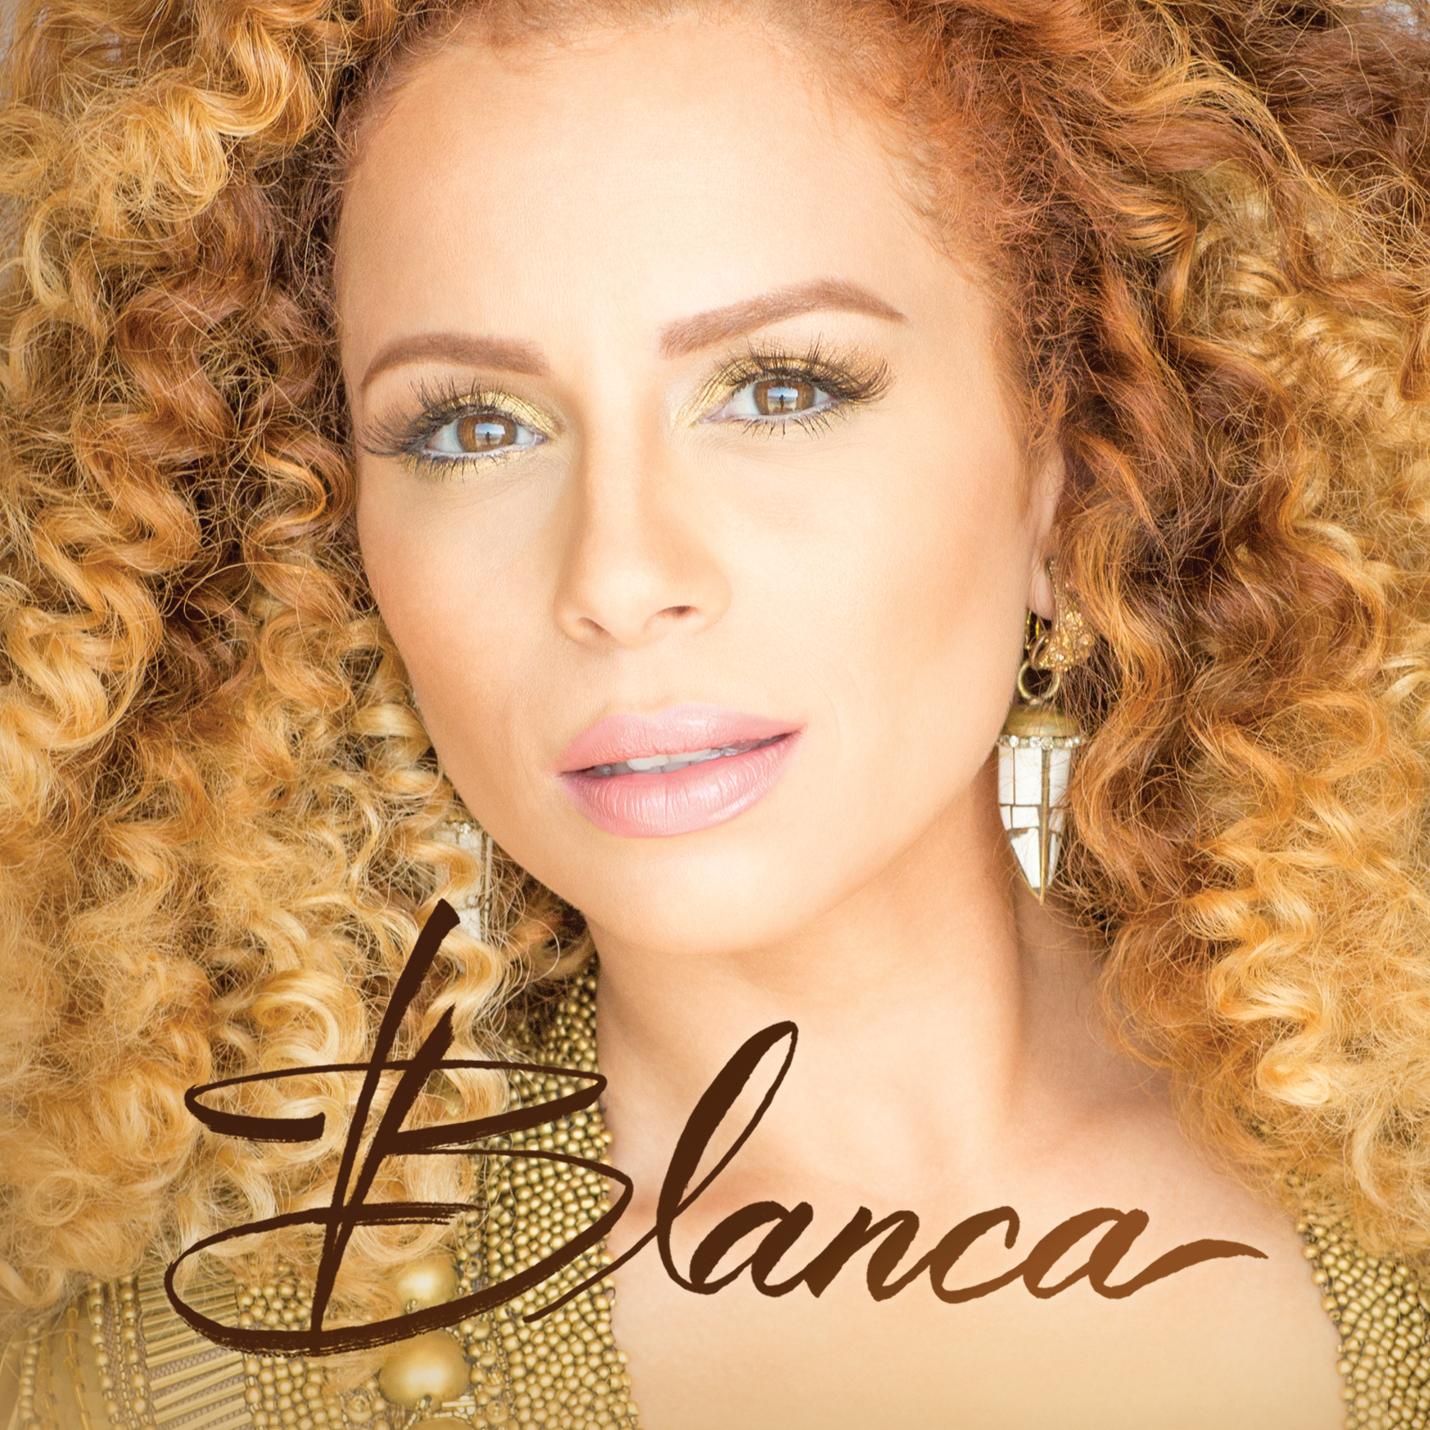 Blanca_Cvr